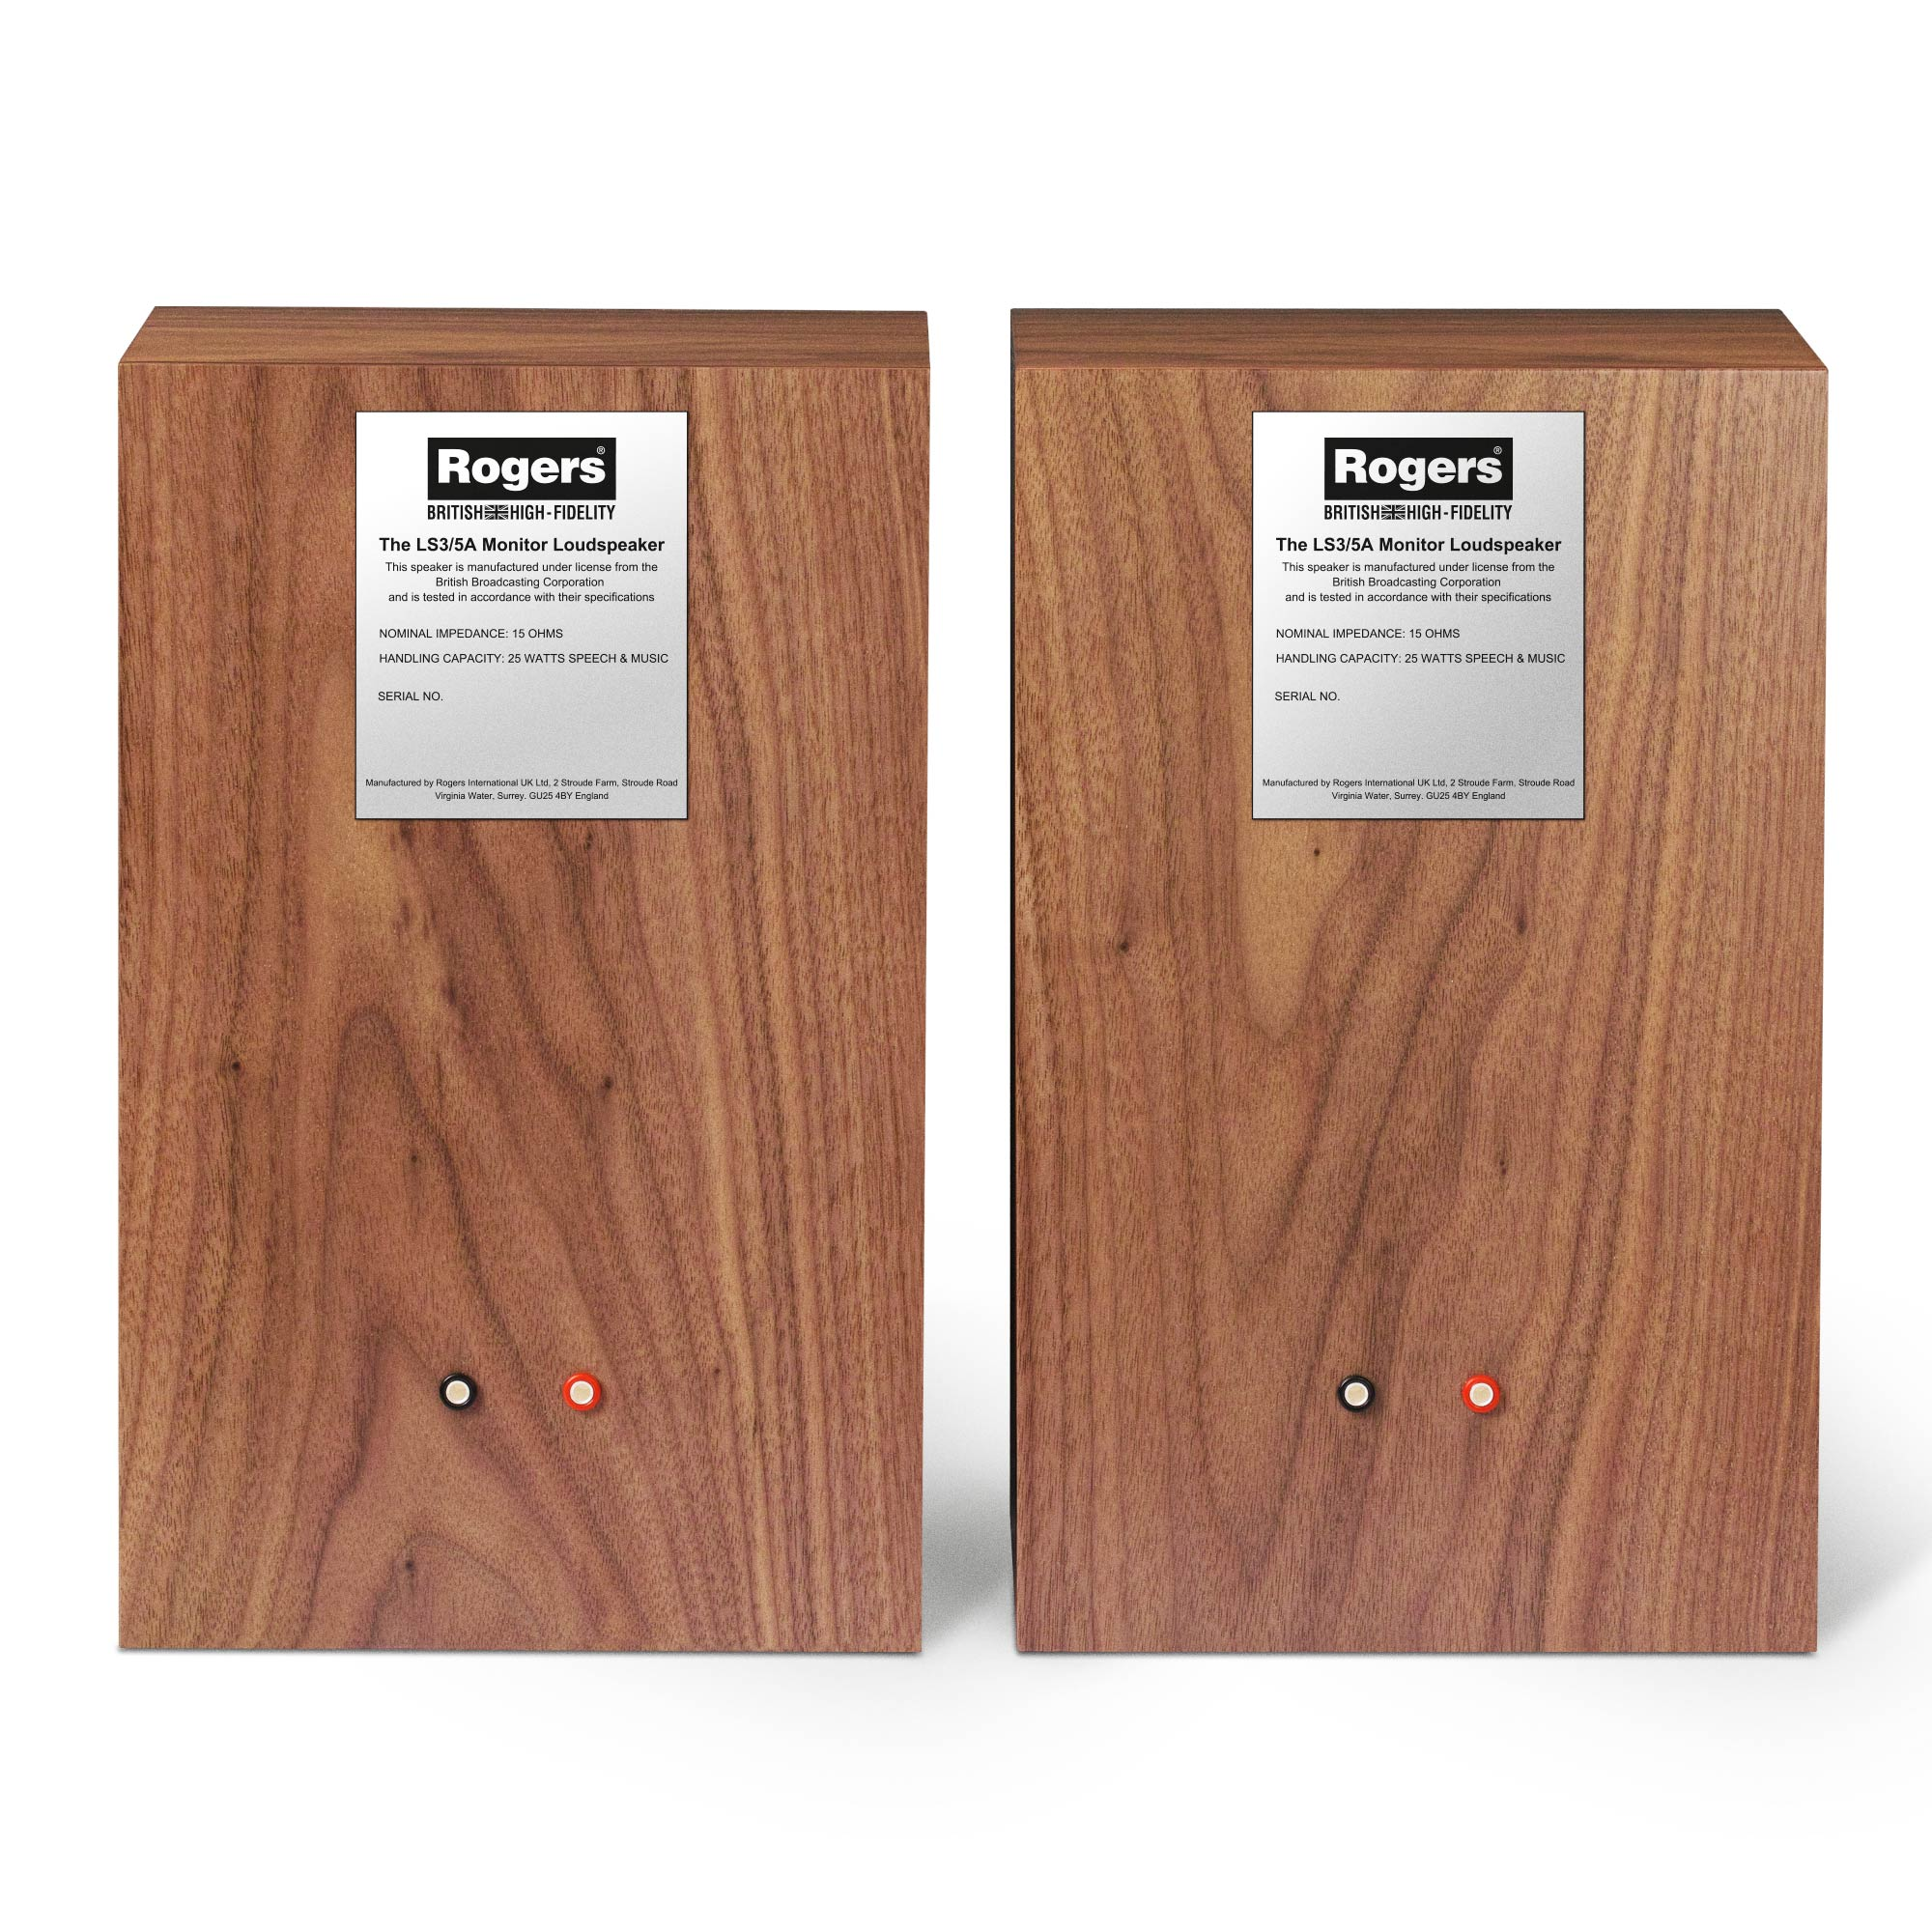 rogers-ls3-5a-speaker-4.jpg